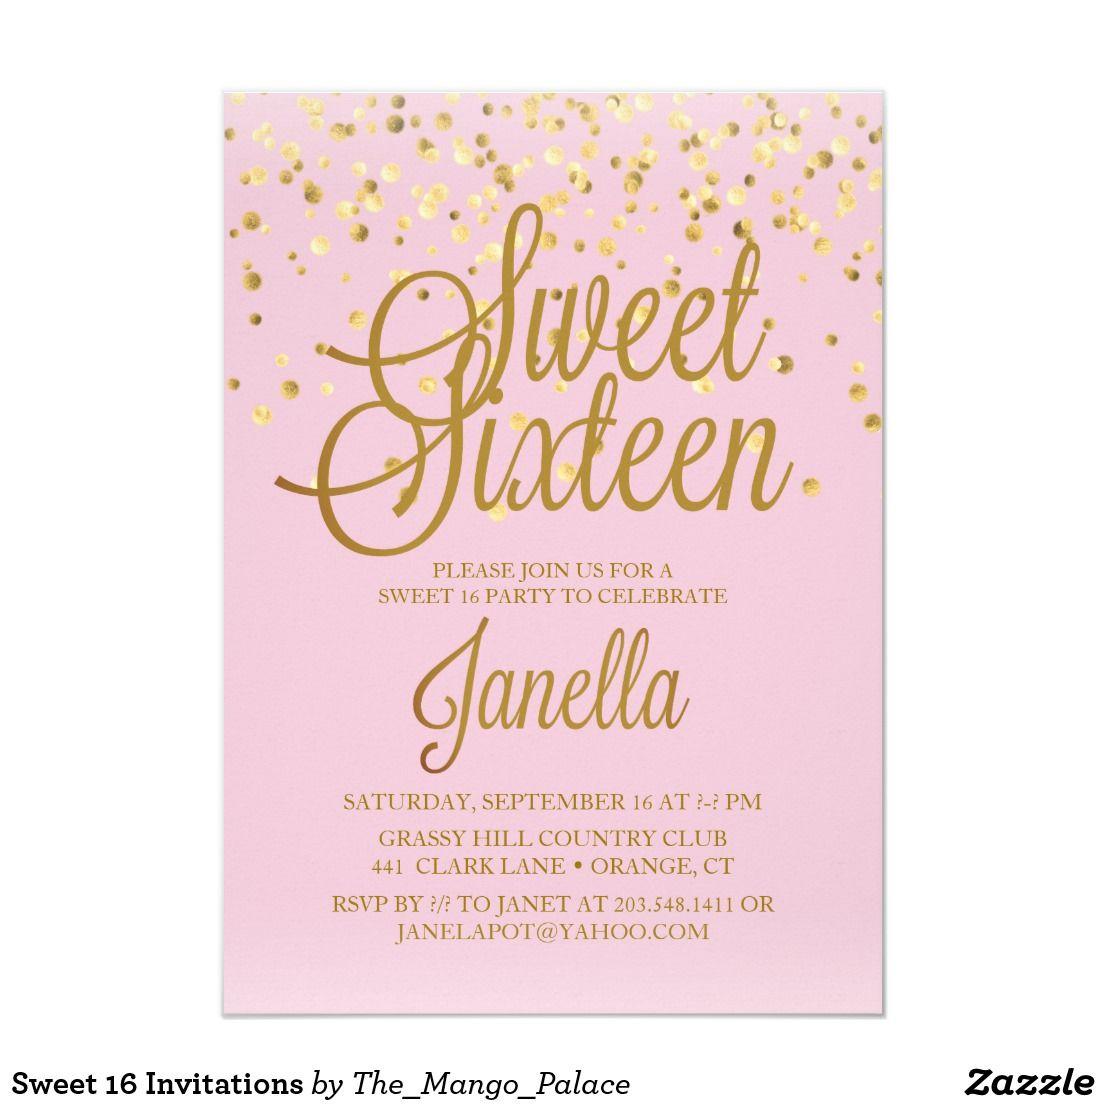 Sweet 16 Invitations Zazzle